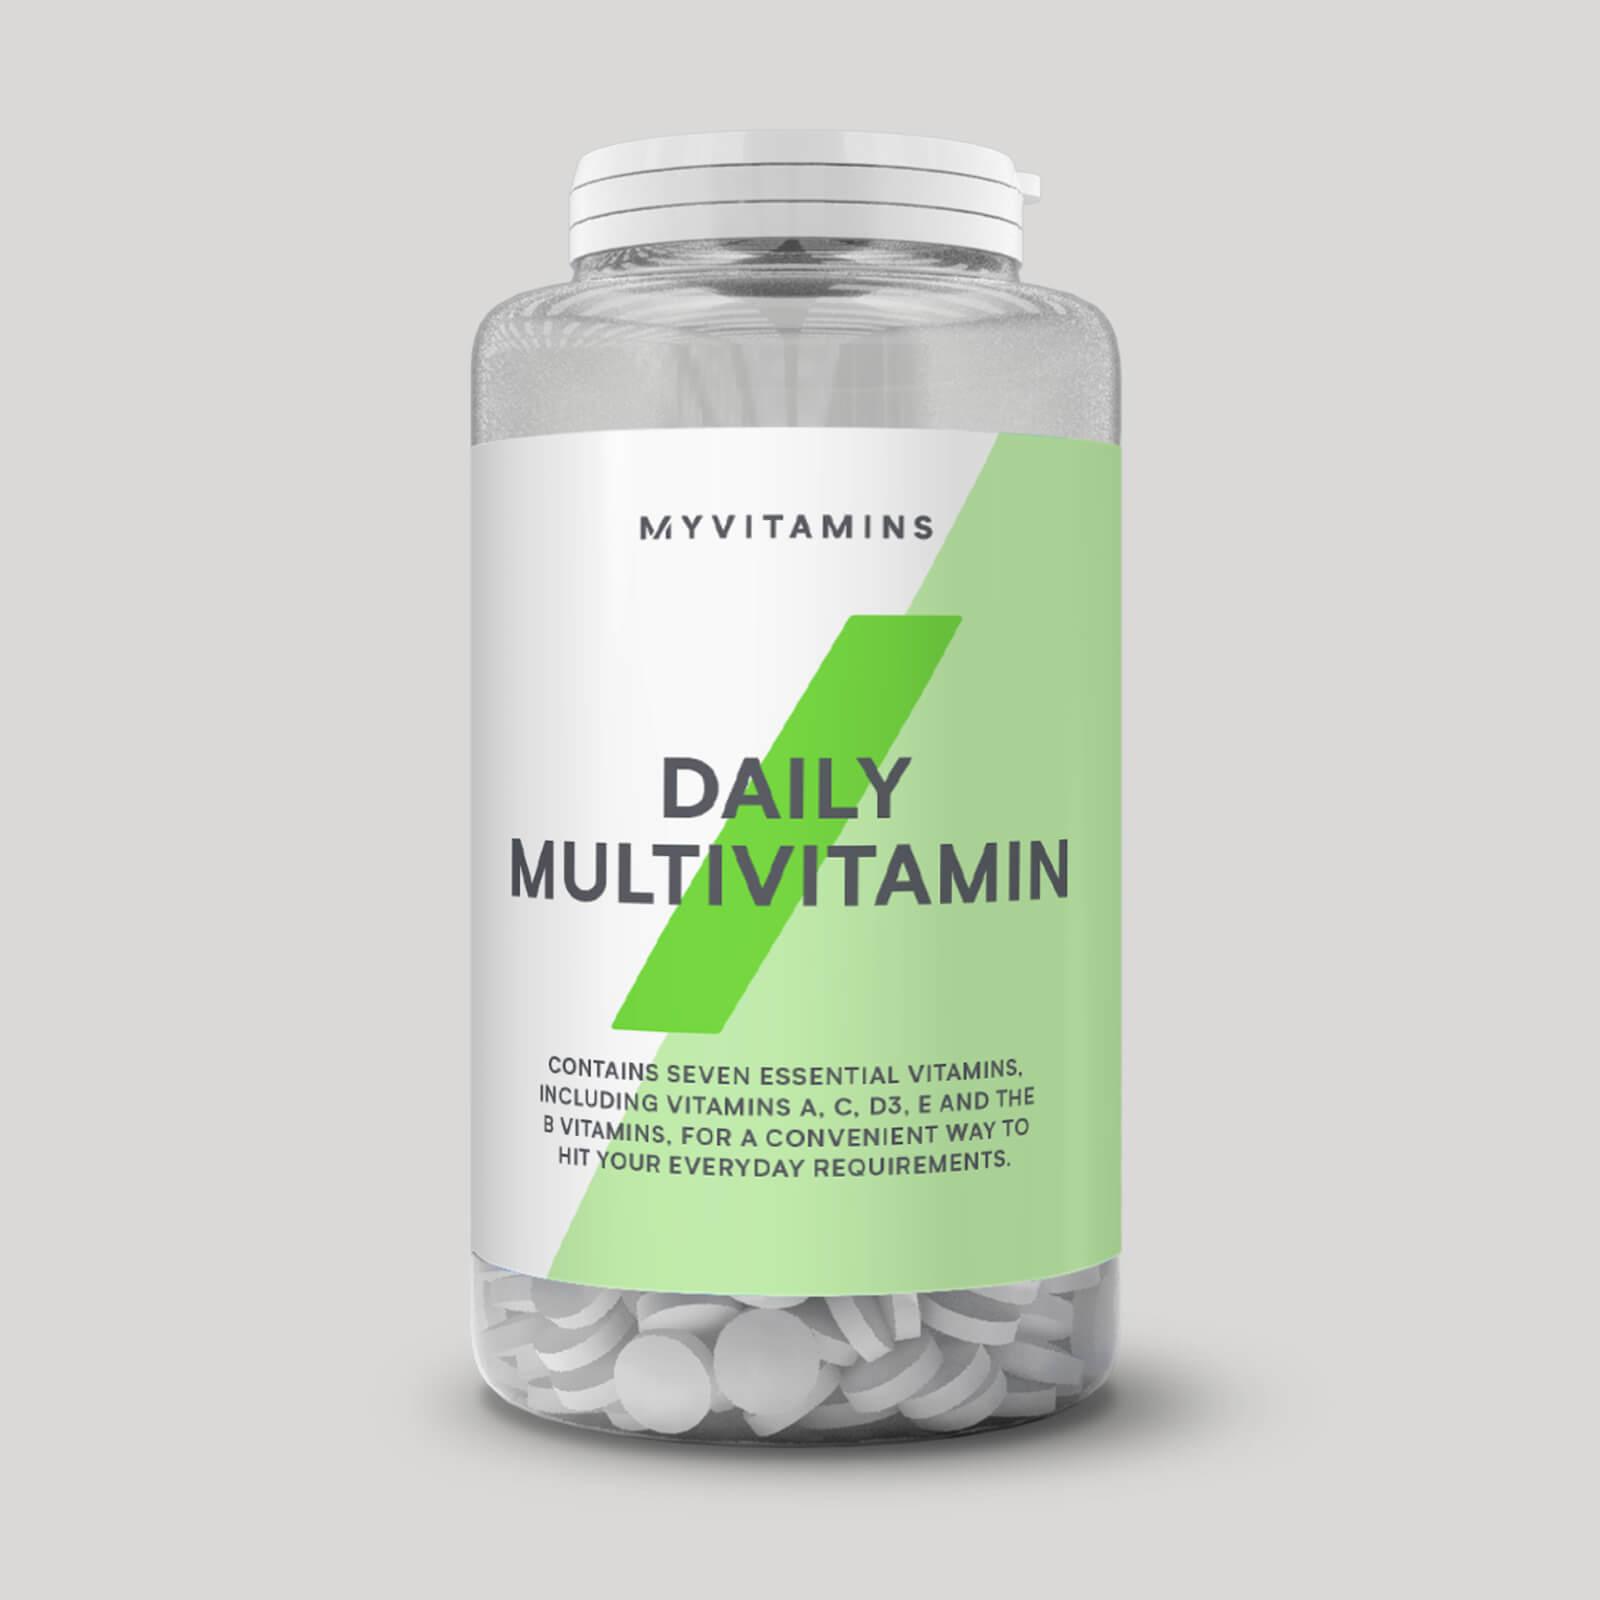 Daily Multivitamins